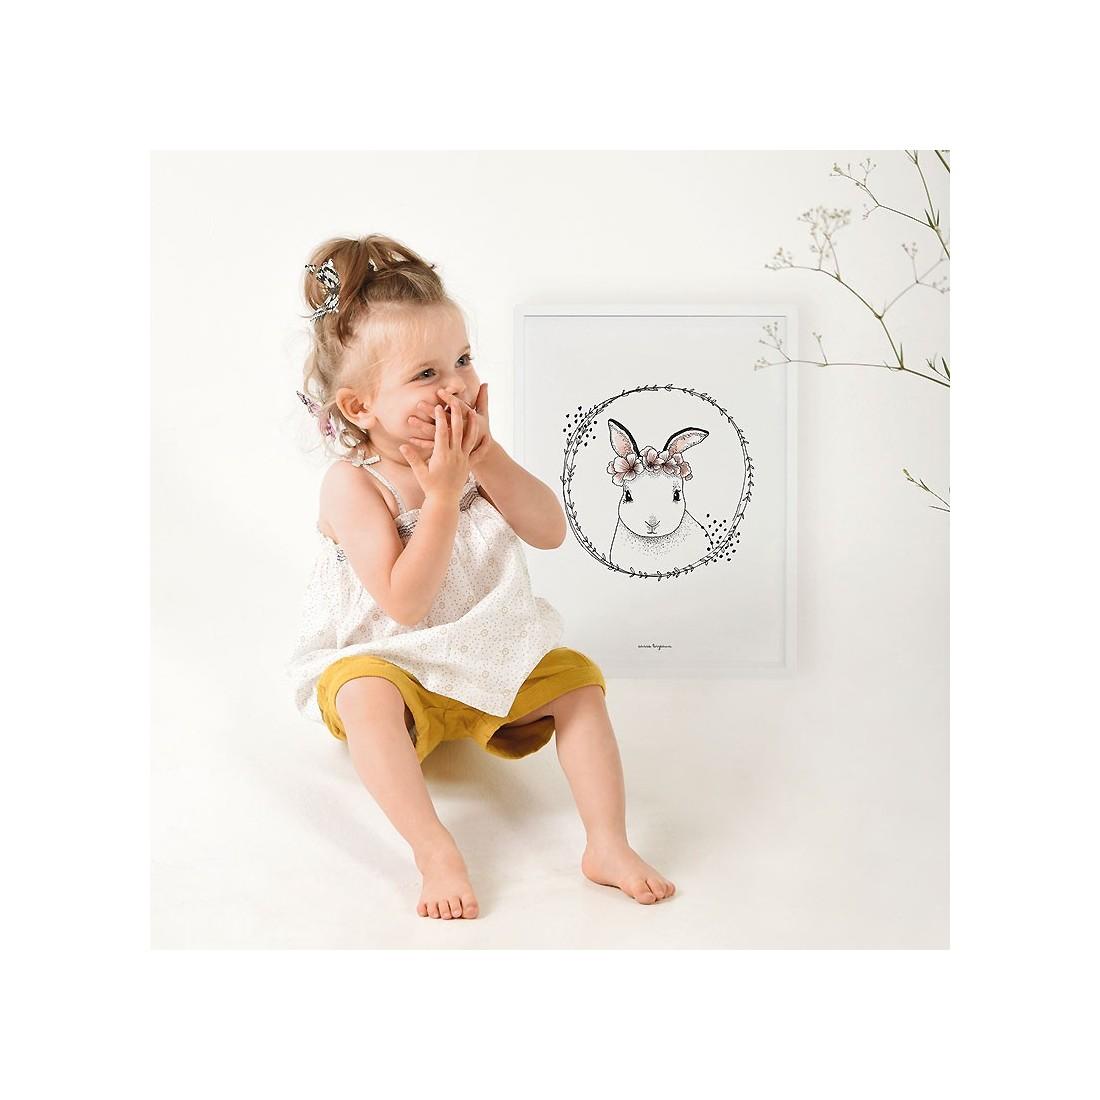 tableau enfant affiche encadr e lapin blanc lilipinso ma. Black Bedroom Furniture Sets. Home Design Ideas